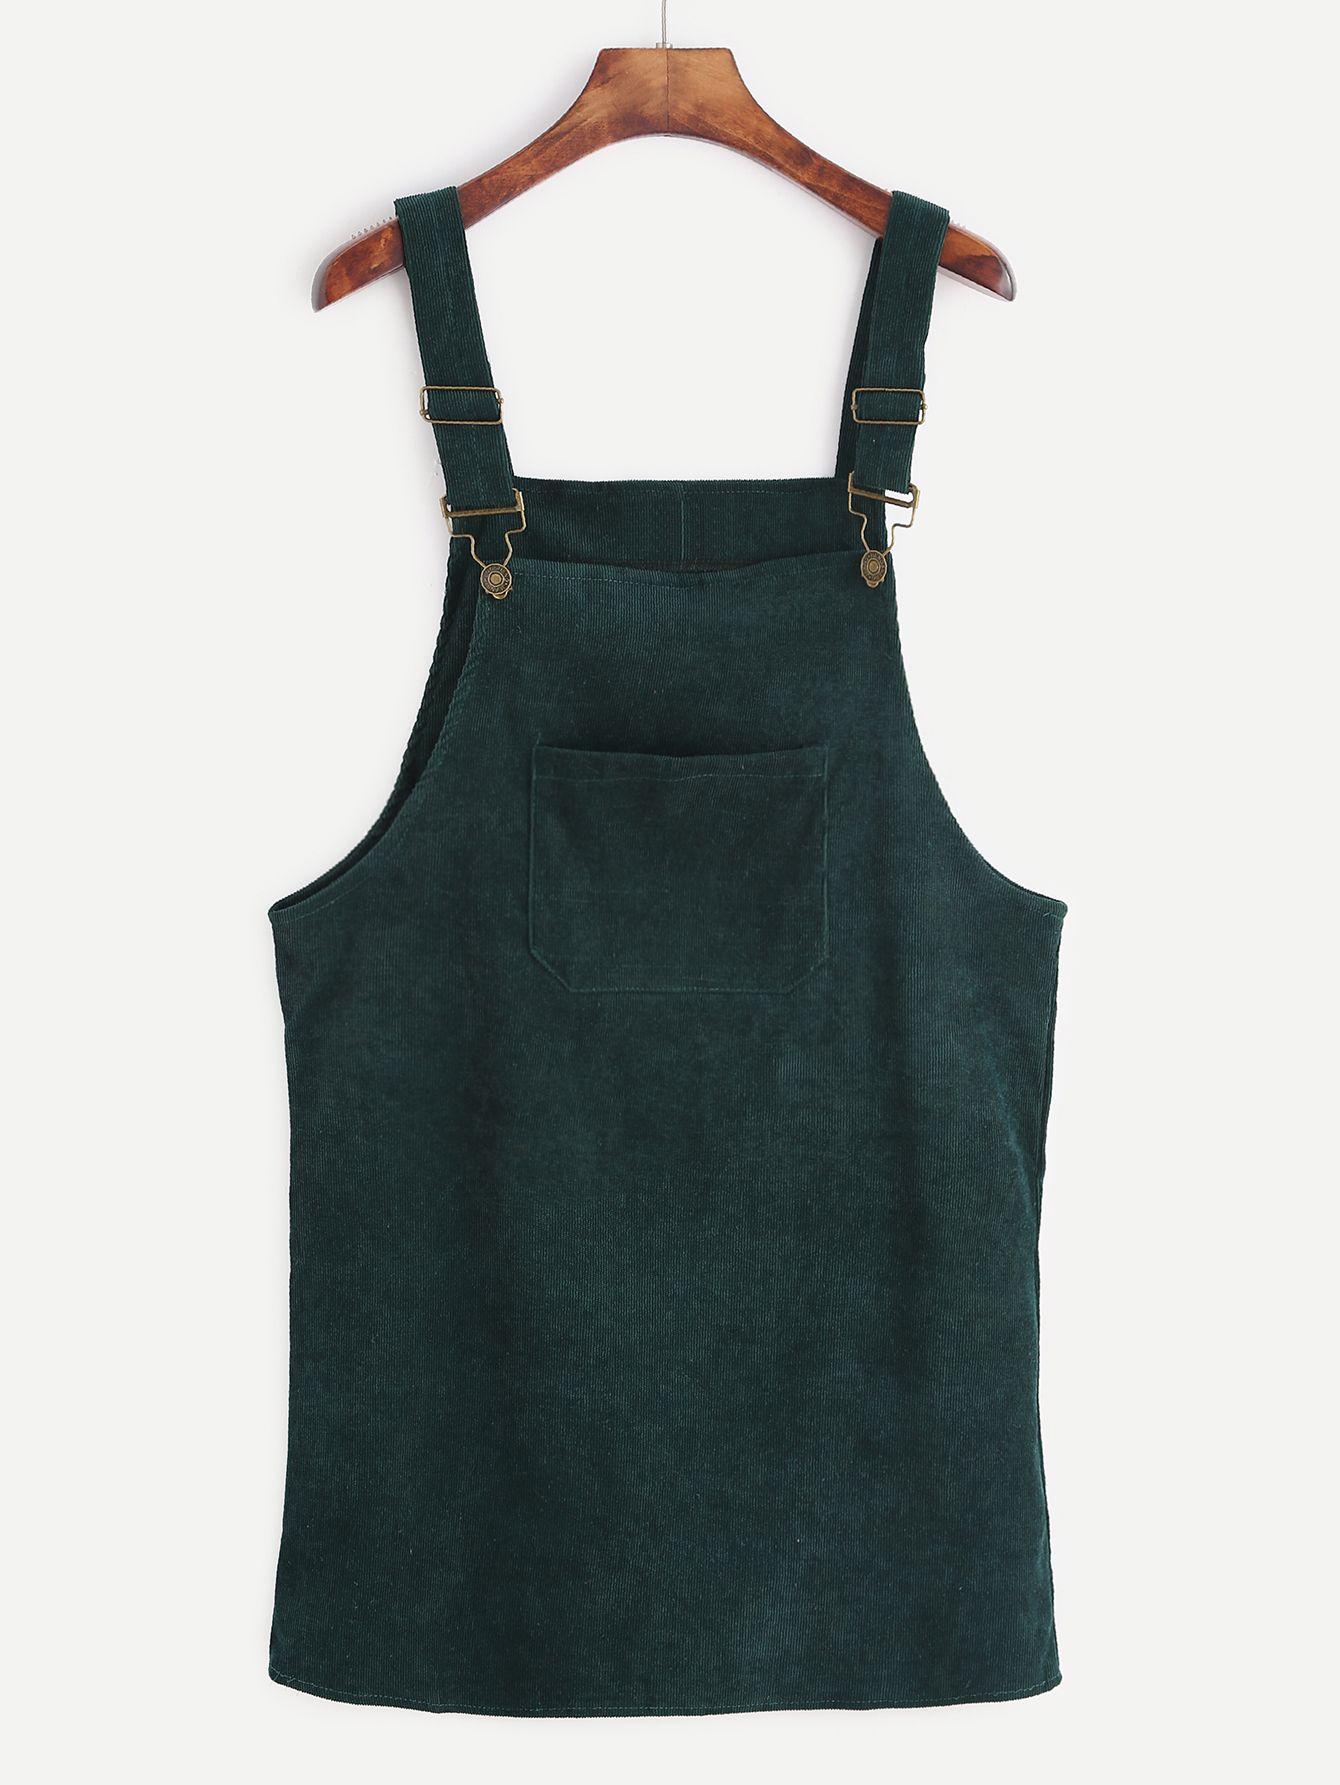 Shop Dark Green Corduroy Overall Dress With Pocket Online Shein Offers Dark Green Corduroy Overal Overall Dress Corduroy Overall Dress Corduroy Pinafore Dress [ 1785 x 1340 Pixel ]